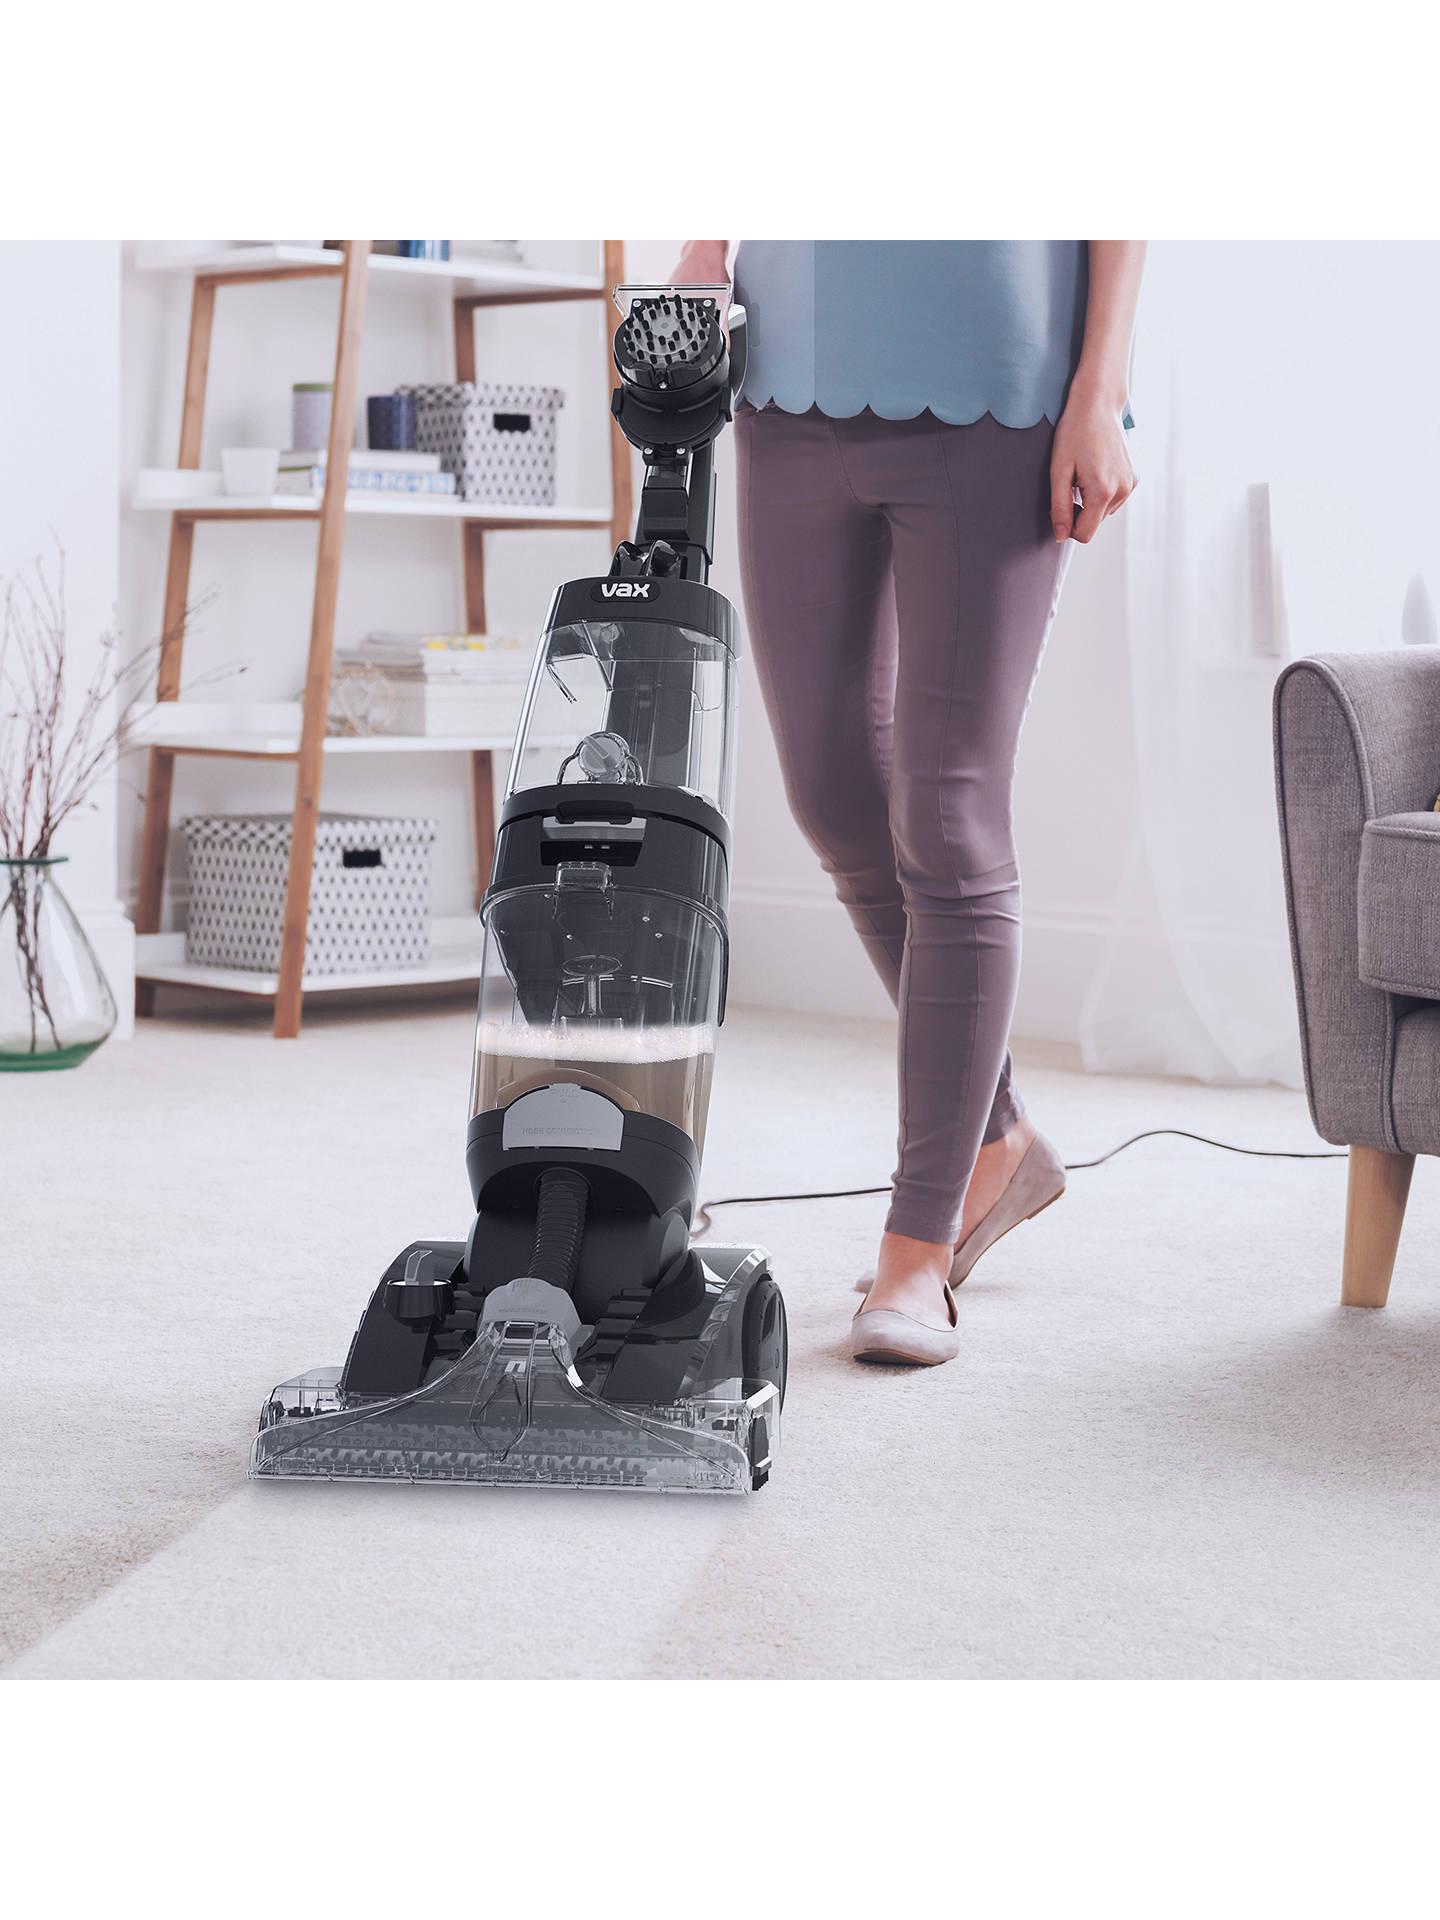 ... Buy Vax ECB1SPV1 Platinum Power Max Carpet Cleaner Online at johnlewis.com ...